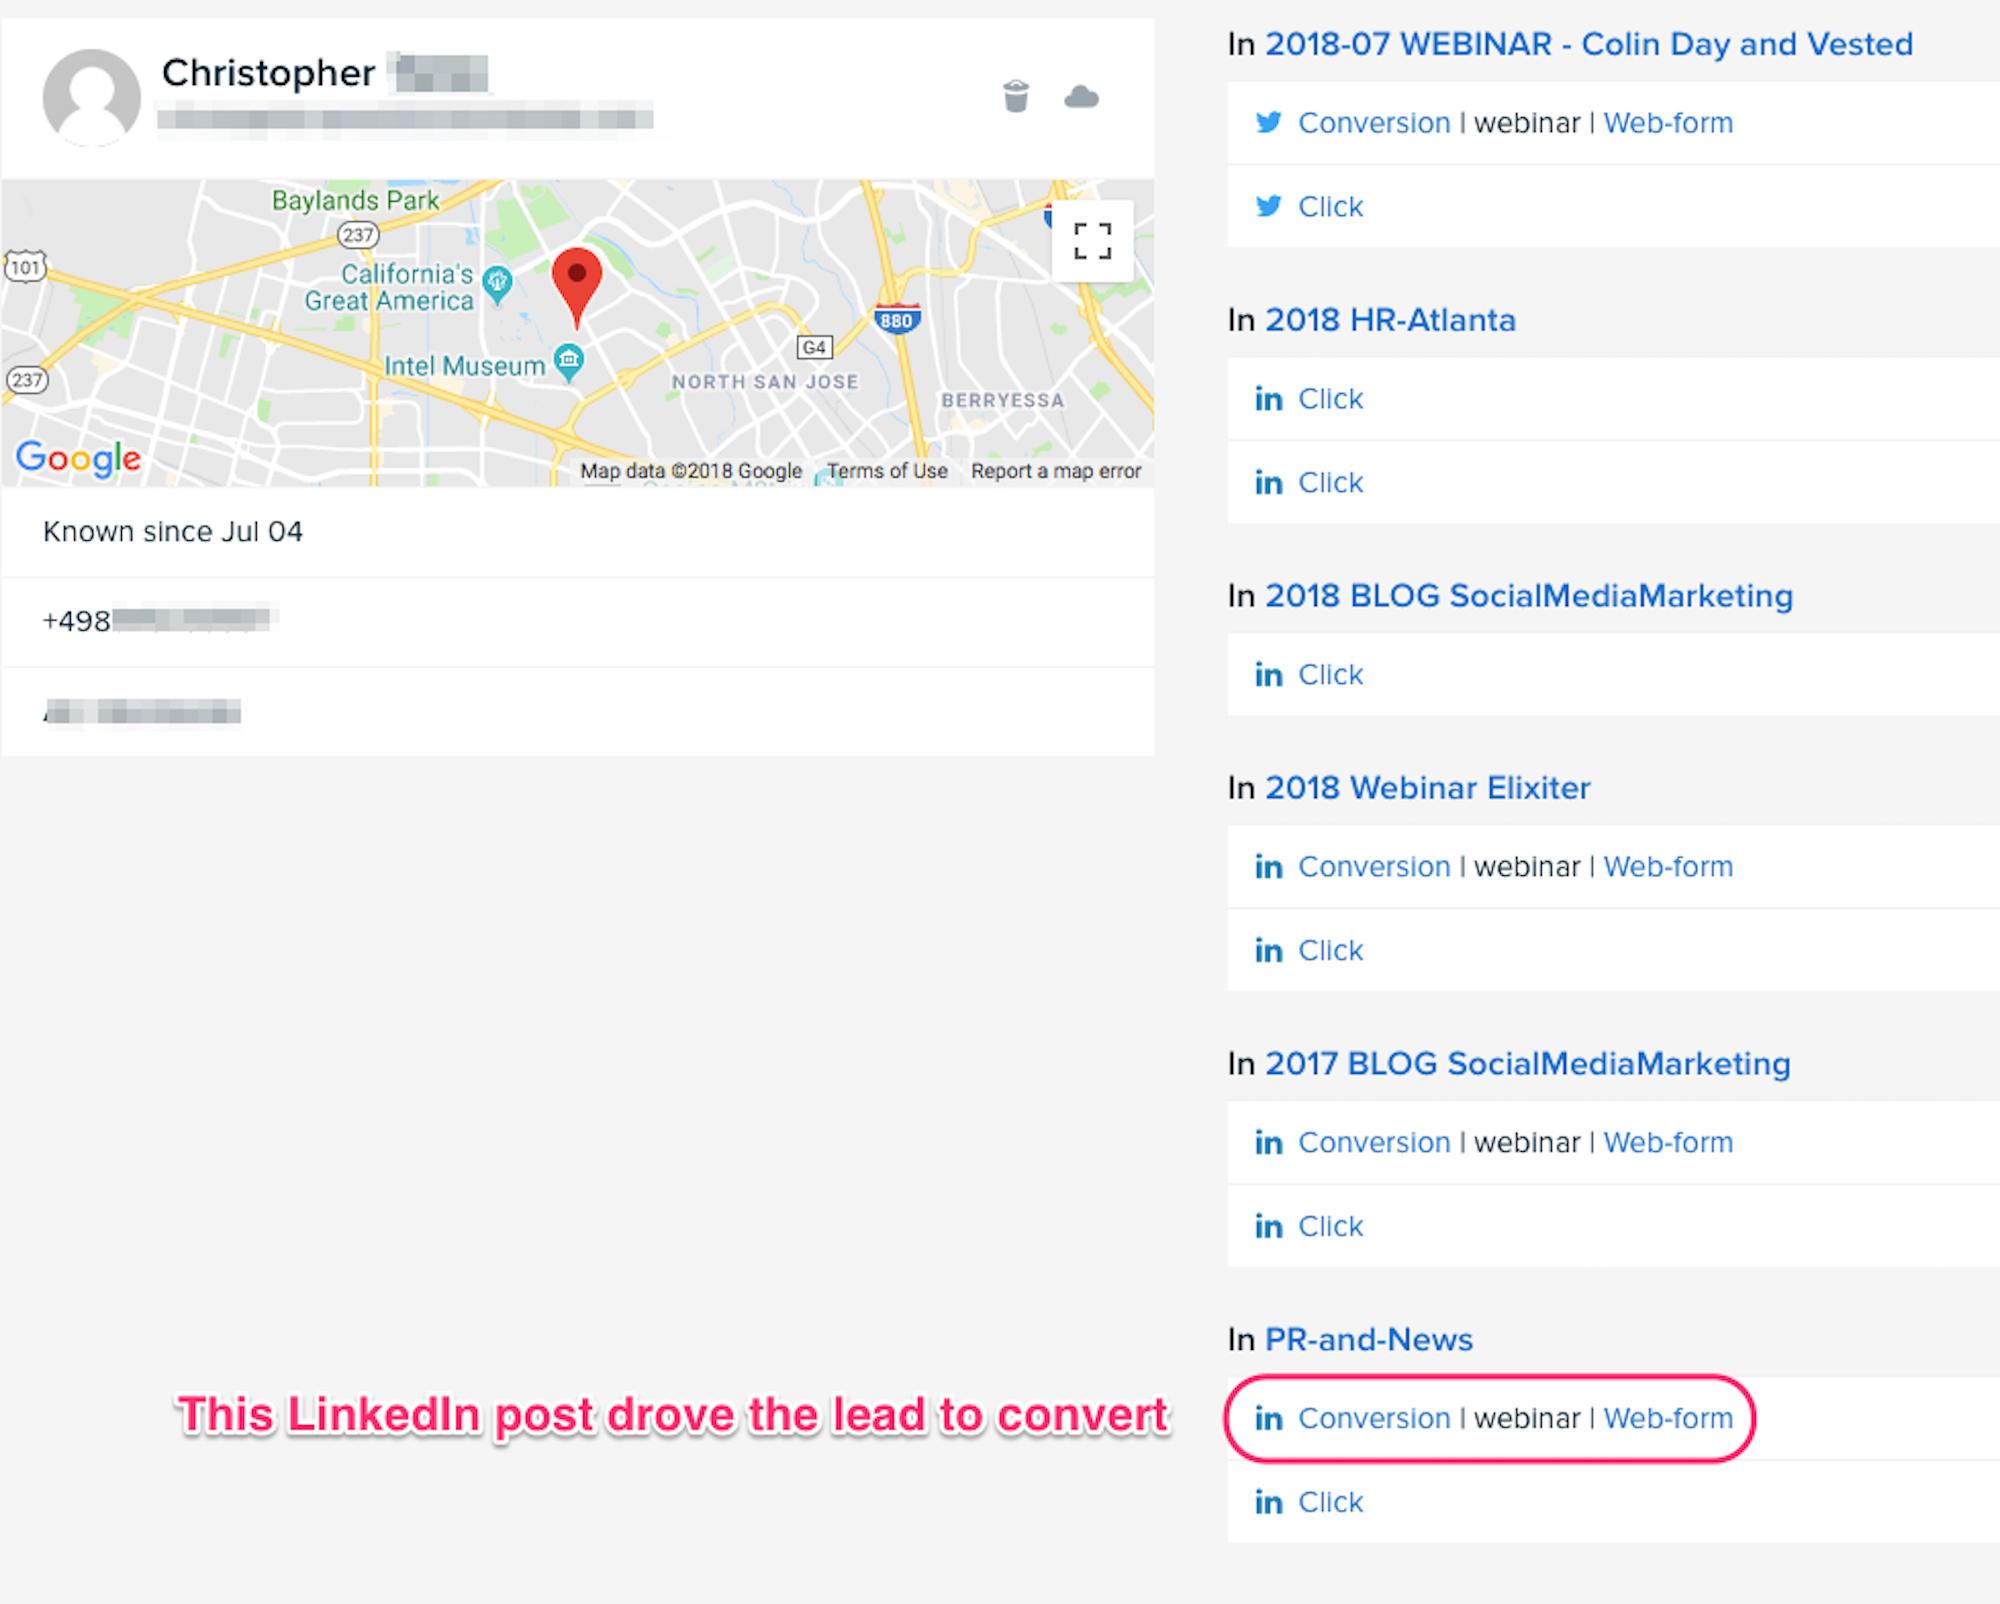 Basing decisions off of analytics inside your B2B social media management platform